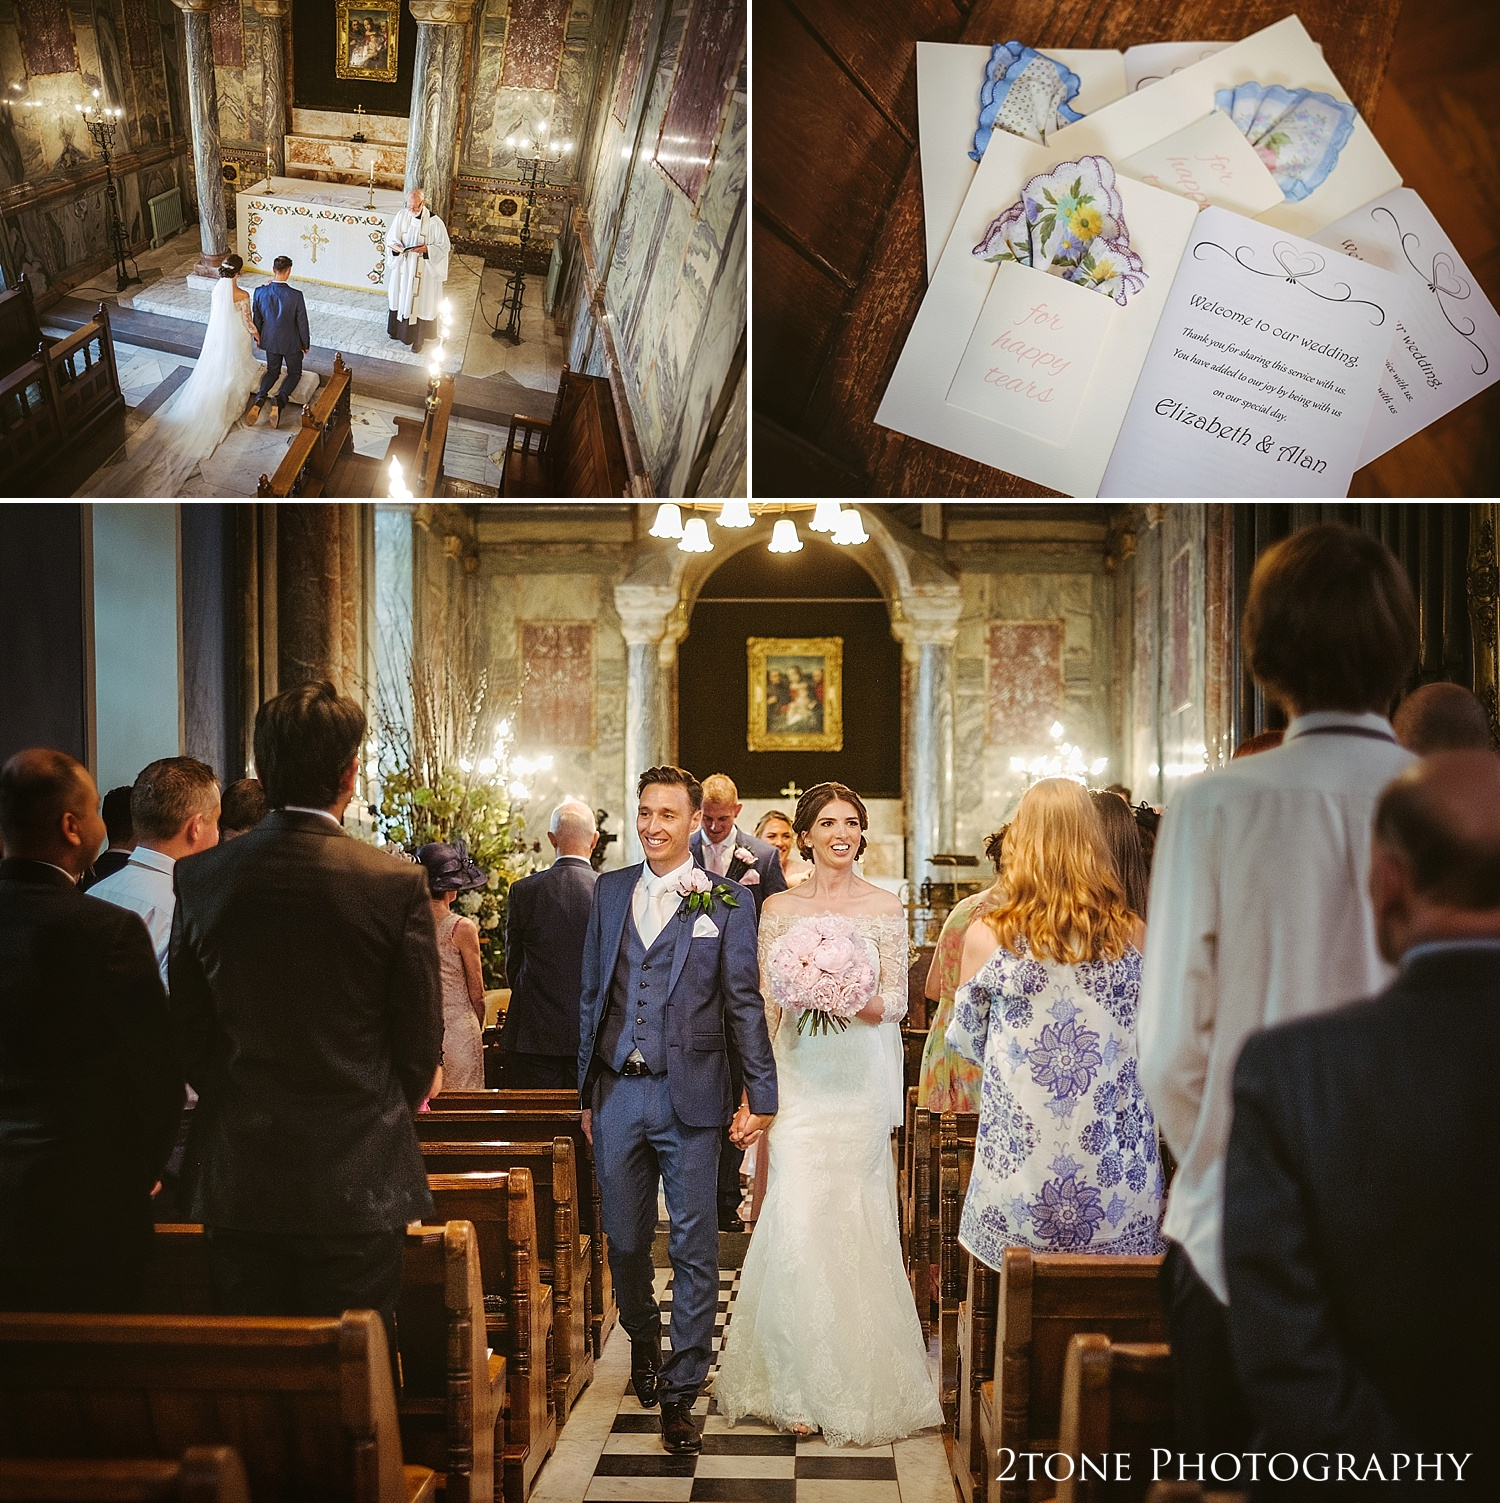 Weddings at Wynyard Hall Chapel by Durham based wedding photographers www.2tonephotography.co.uk